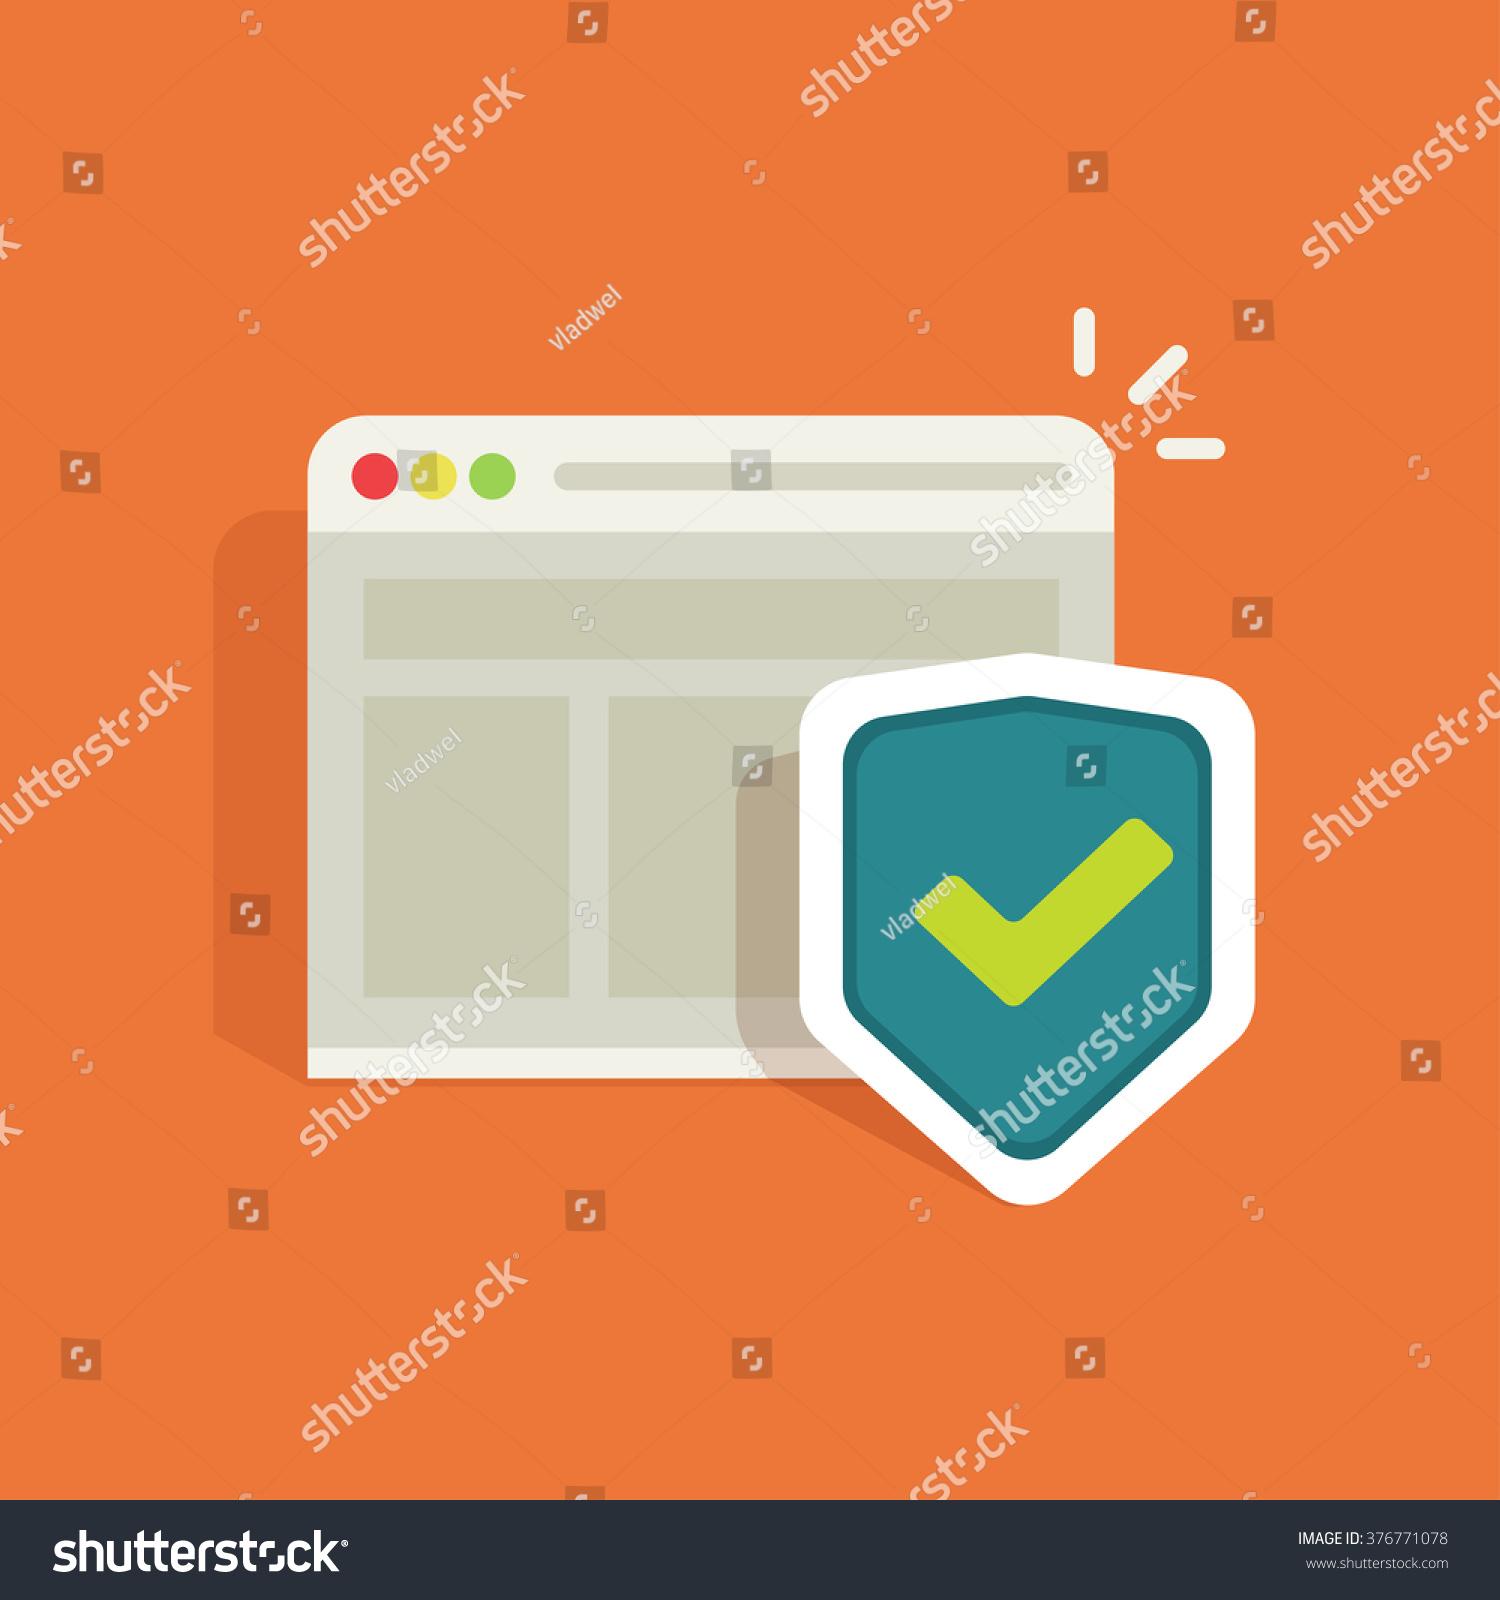 Internet protection symbol data protection shield stock vector internet protection symbol data protection shield logo information security flat icon antivirus emblem biocorpaavc